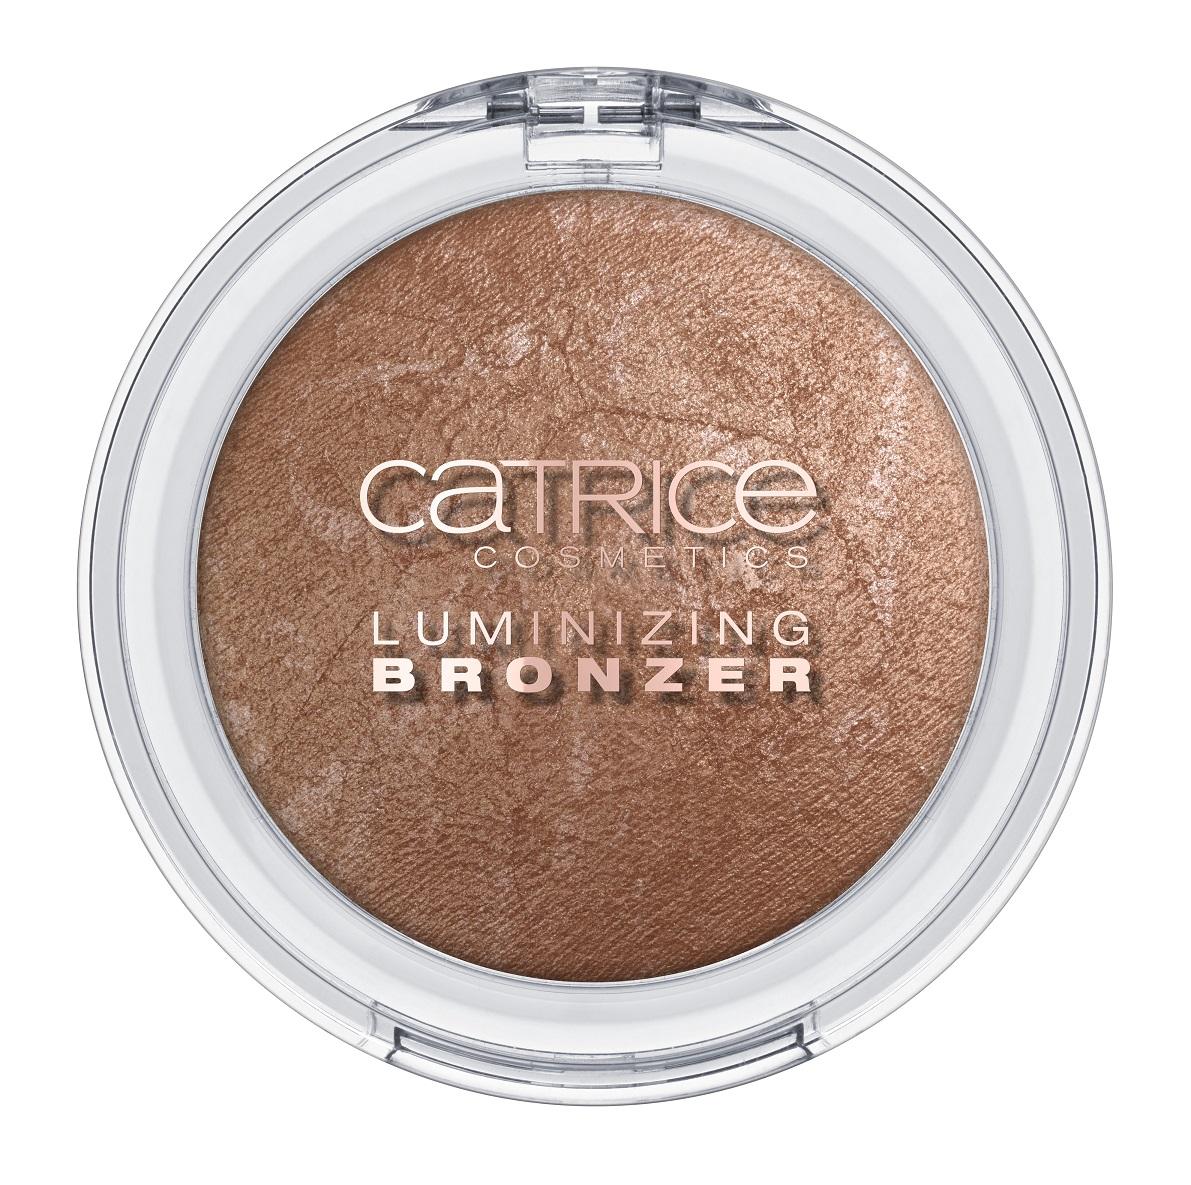 Metallure by CATRICE – Luminizing Bronzer